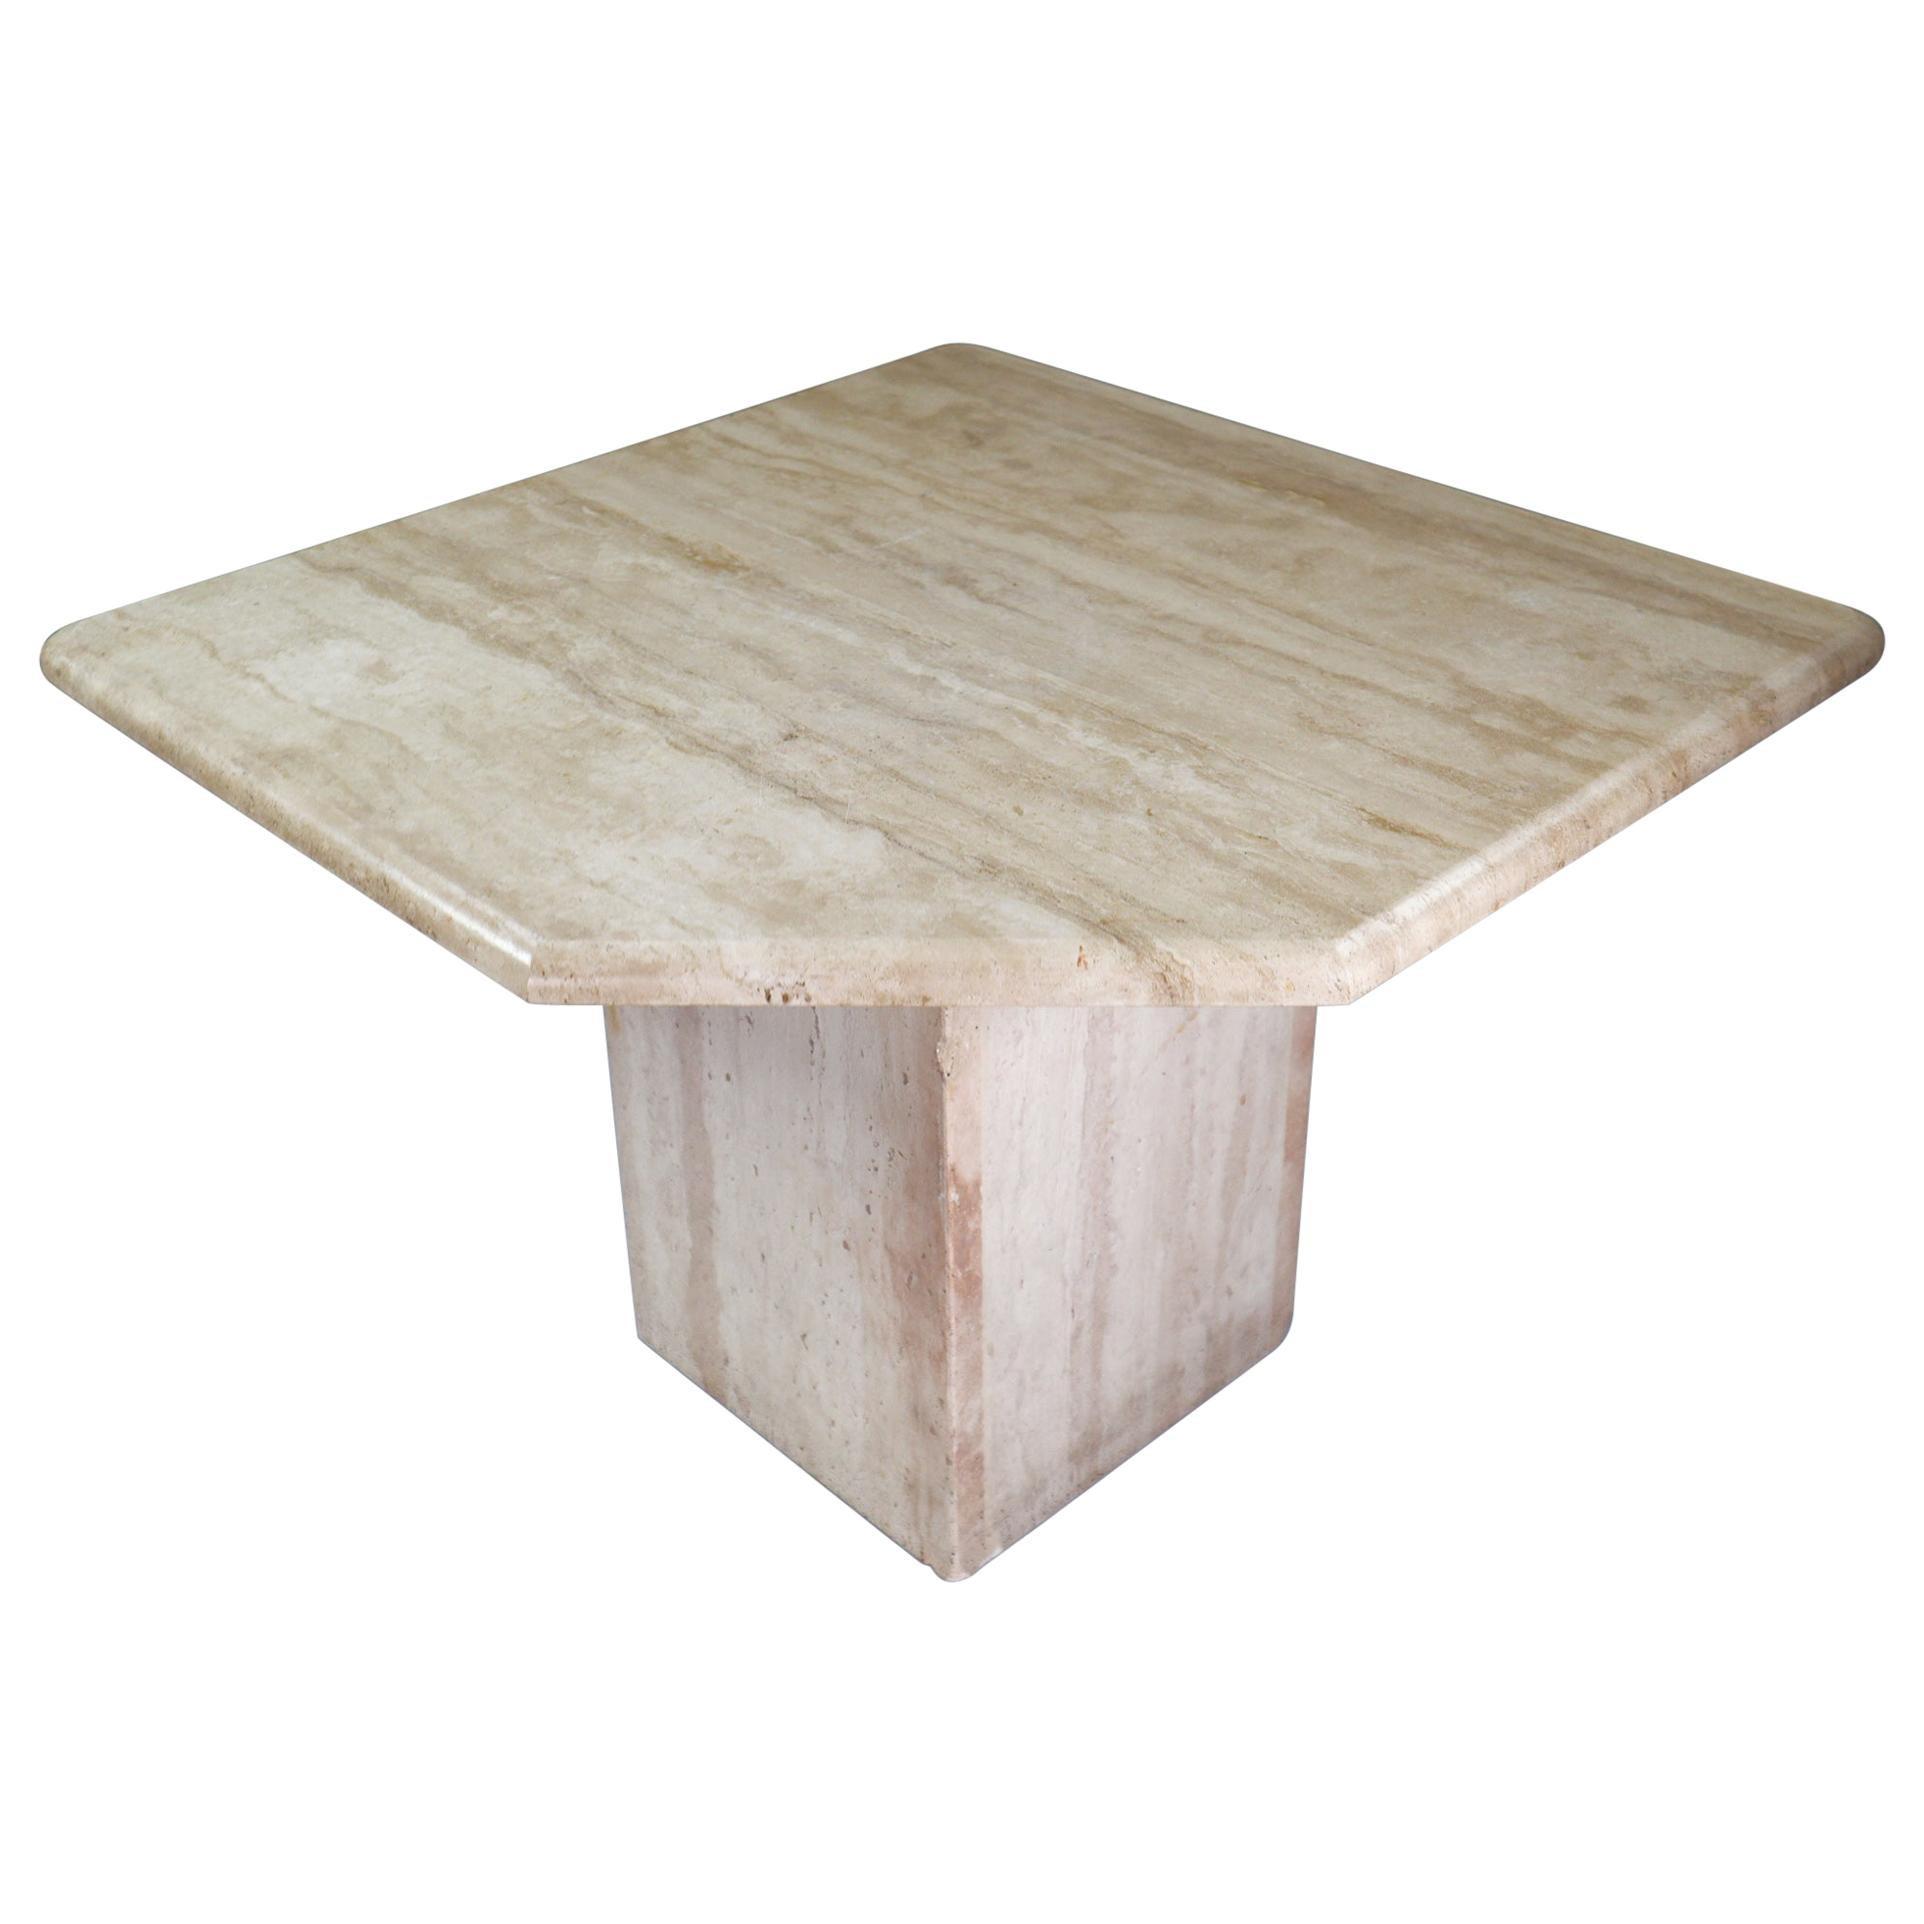 Italian Post-Modern Travertine Side/Coffee Table, 1970s